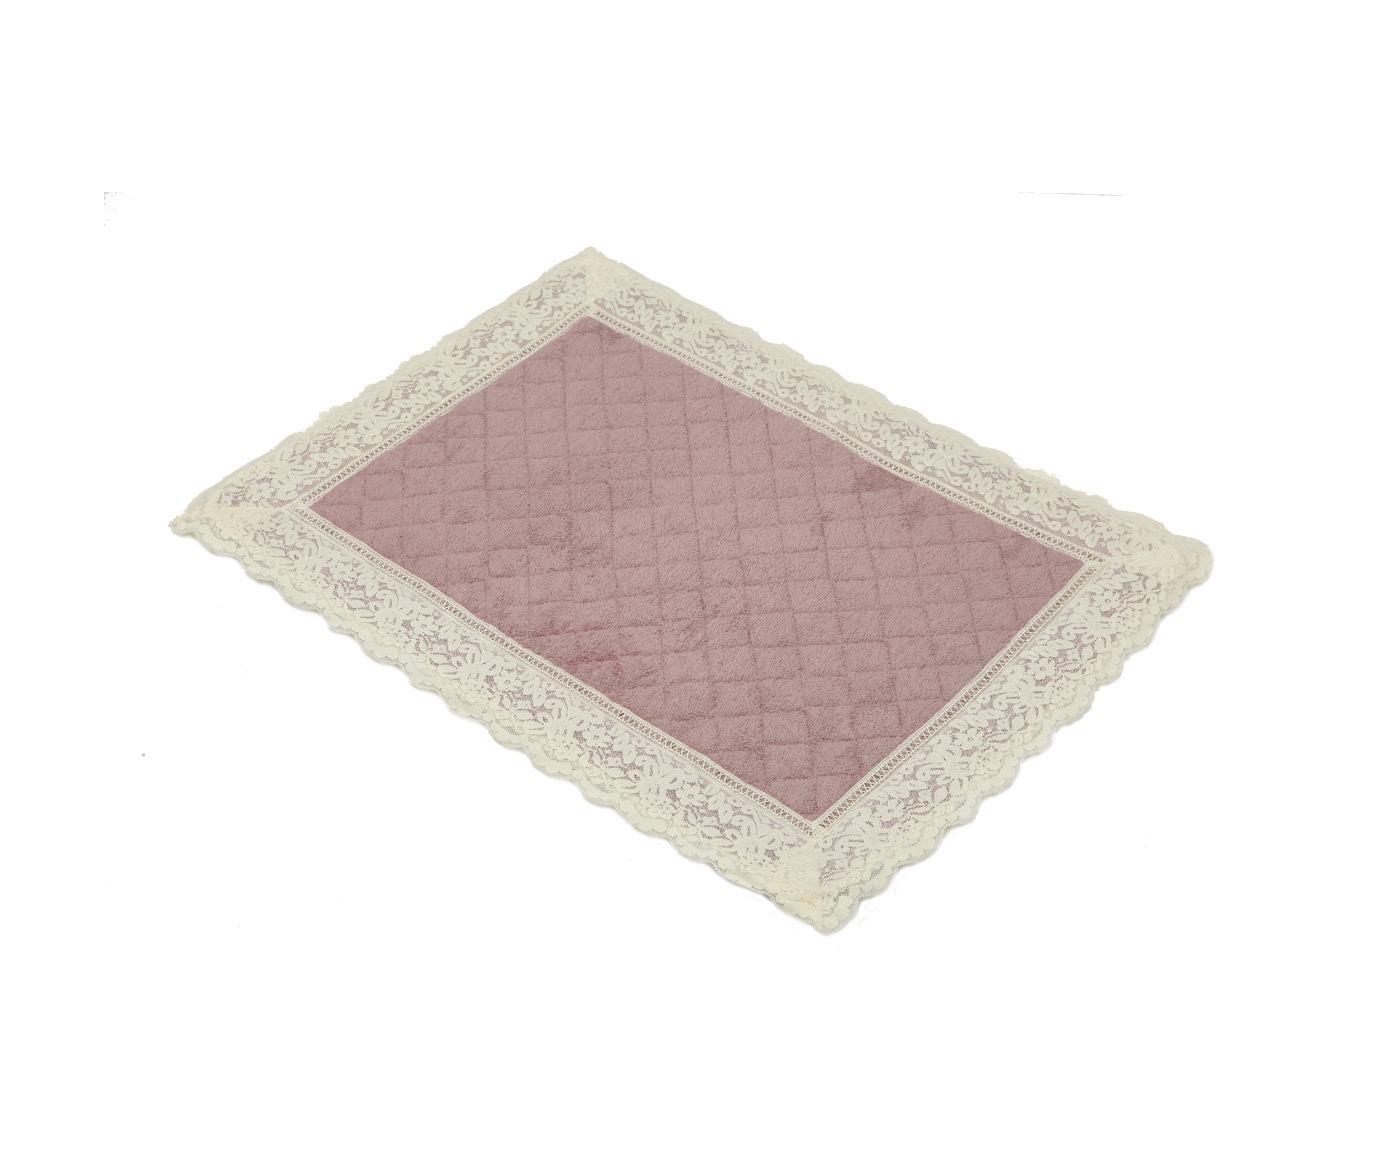 Коврики для ванной Коврик для ванной 50х70 Old Florence Валансье розовый elitnyy-kovrik-dlya-vannoy-valansie-rozovyy-ot-old-florence-italiya-vid.jpg